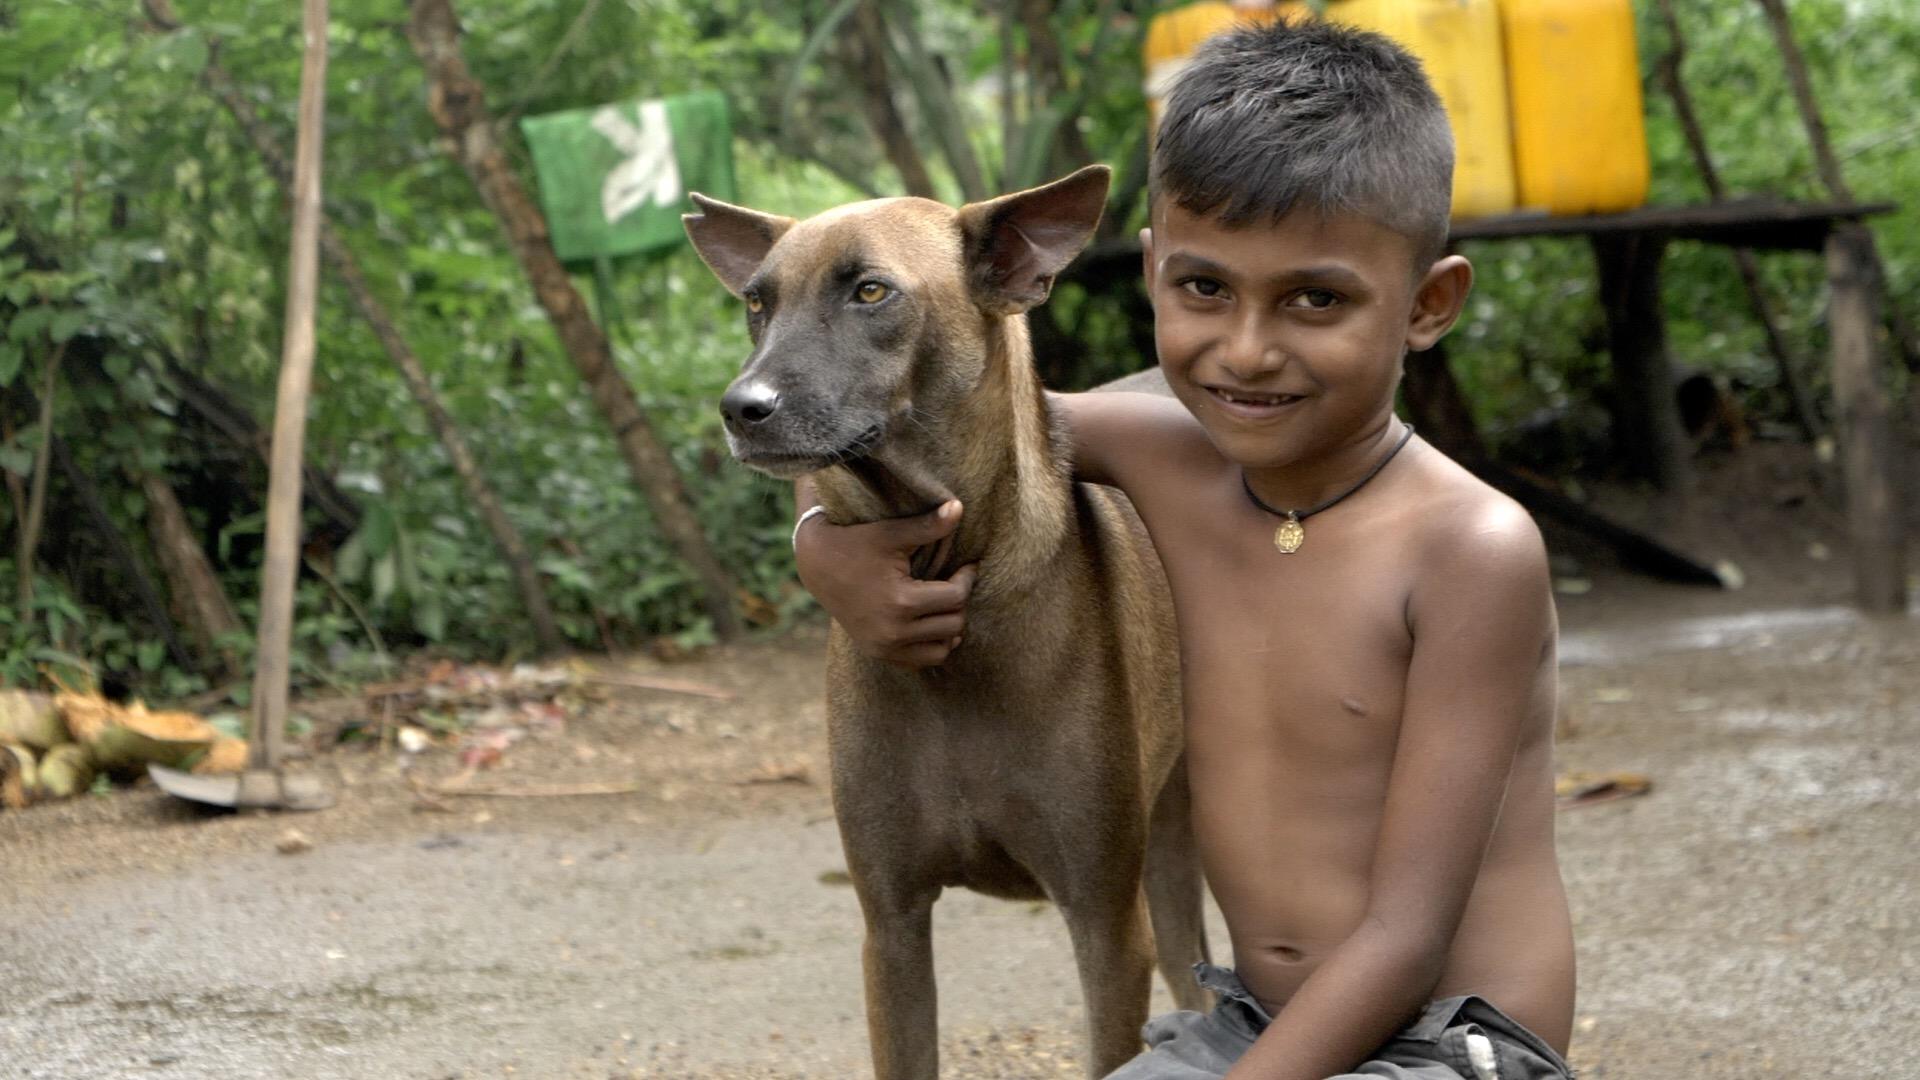 Sri Lankan boy with dog, still from Alex Gatenby film